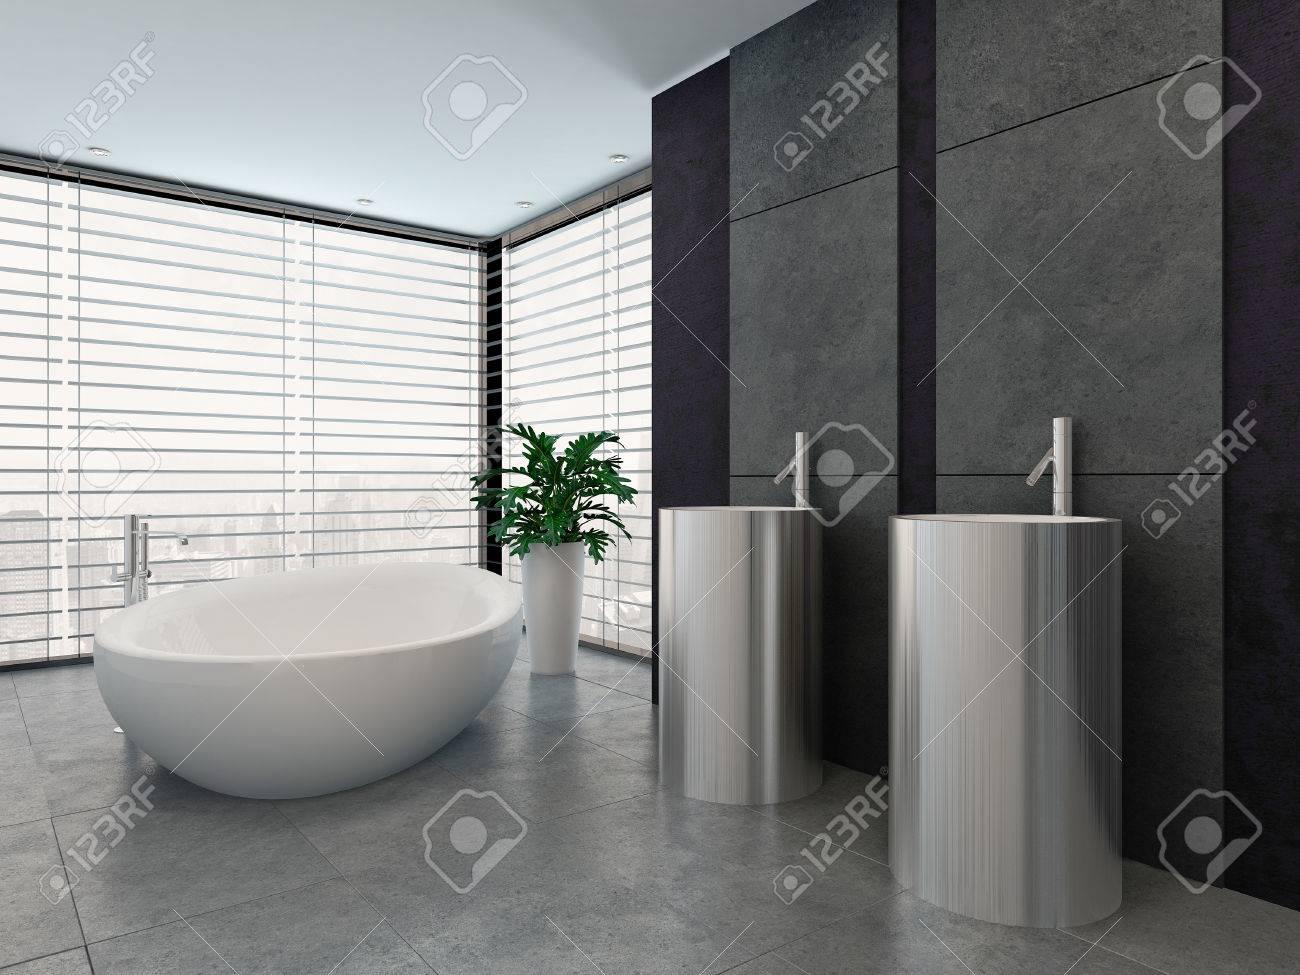 Bathroom Interior With Standalone Bathtub And Two Wash Basins Stock ...